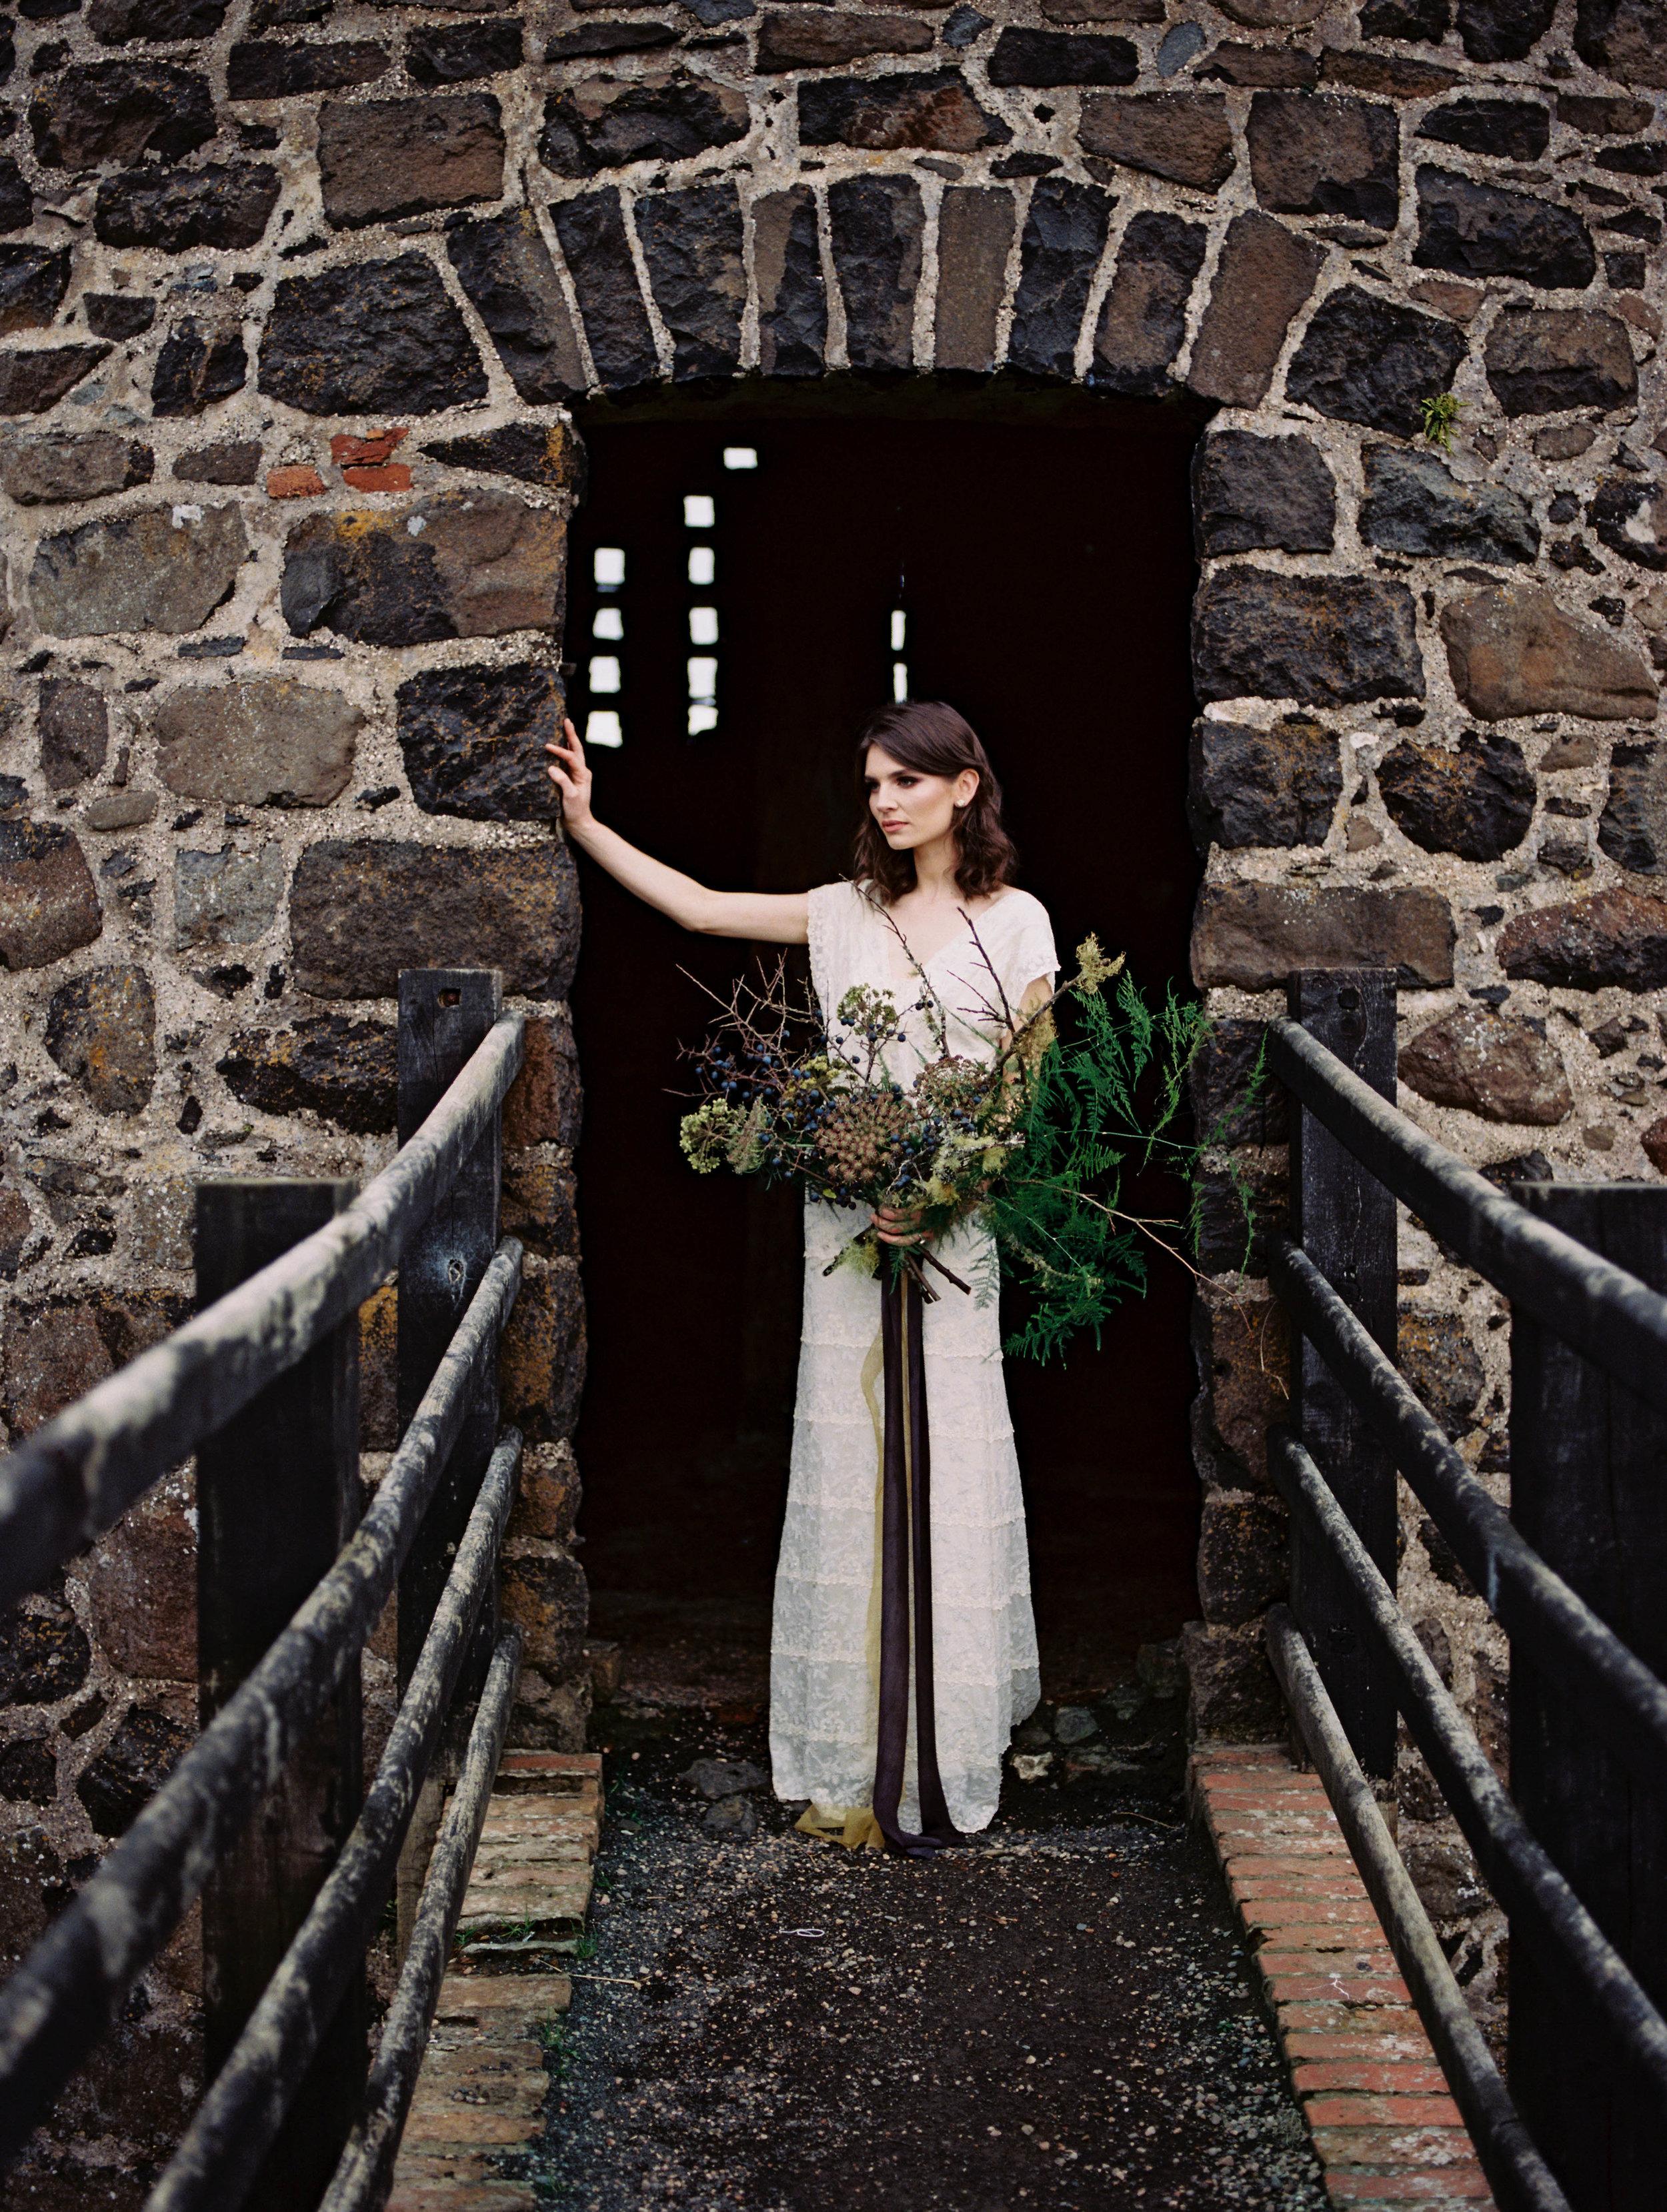 Eli Defaria Photography Northen Ireland Wedding Editorial Inspiration 2018 042.jpg